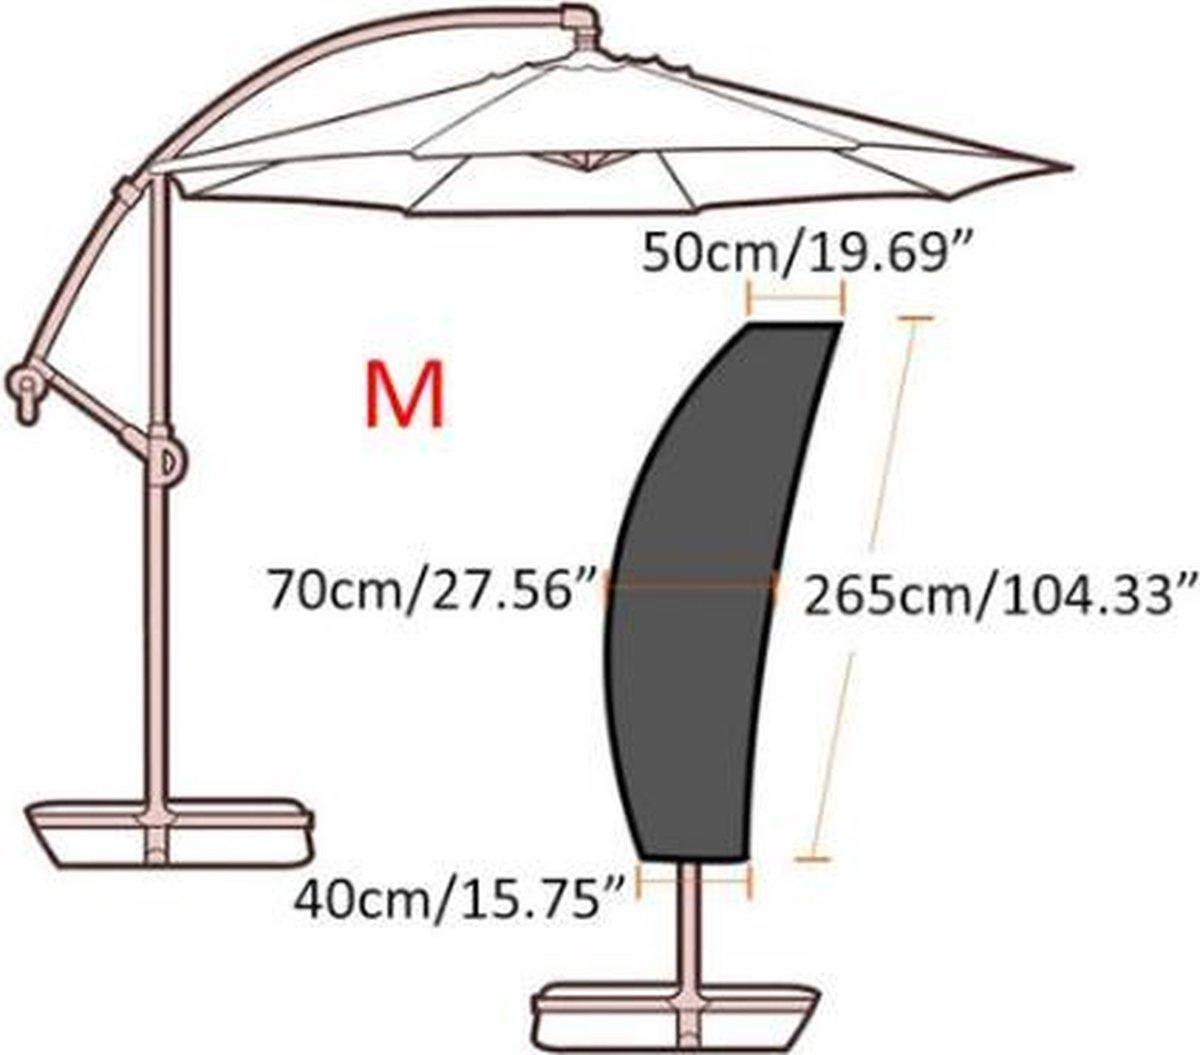 Parasolhoes voor zweefparasol - 265 cm Premium Quality Zwart - diameter parasol 250/350 cm